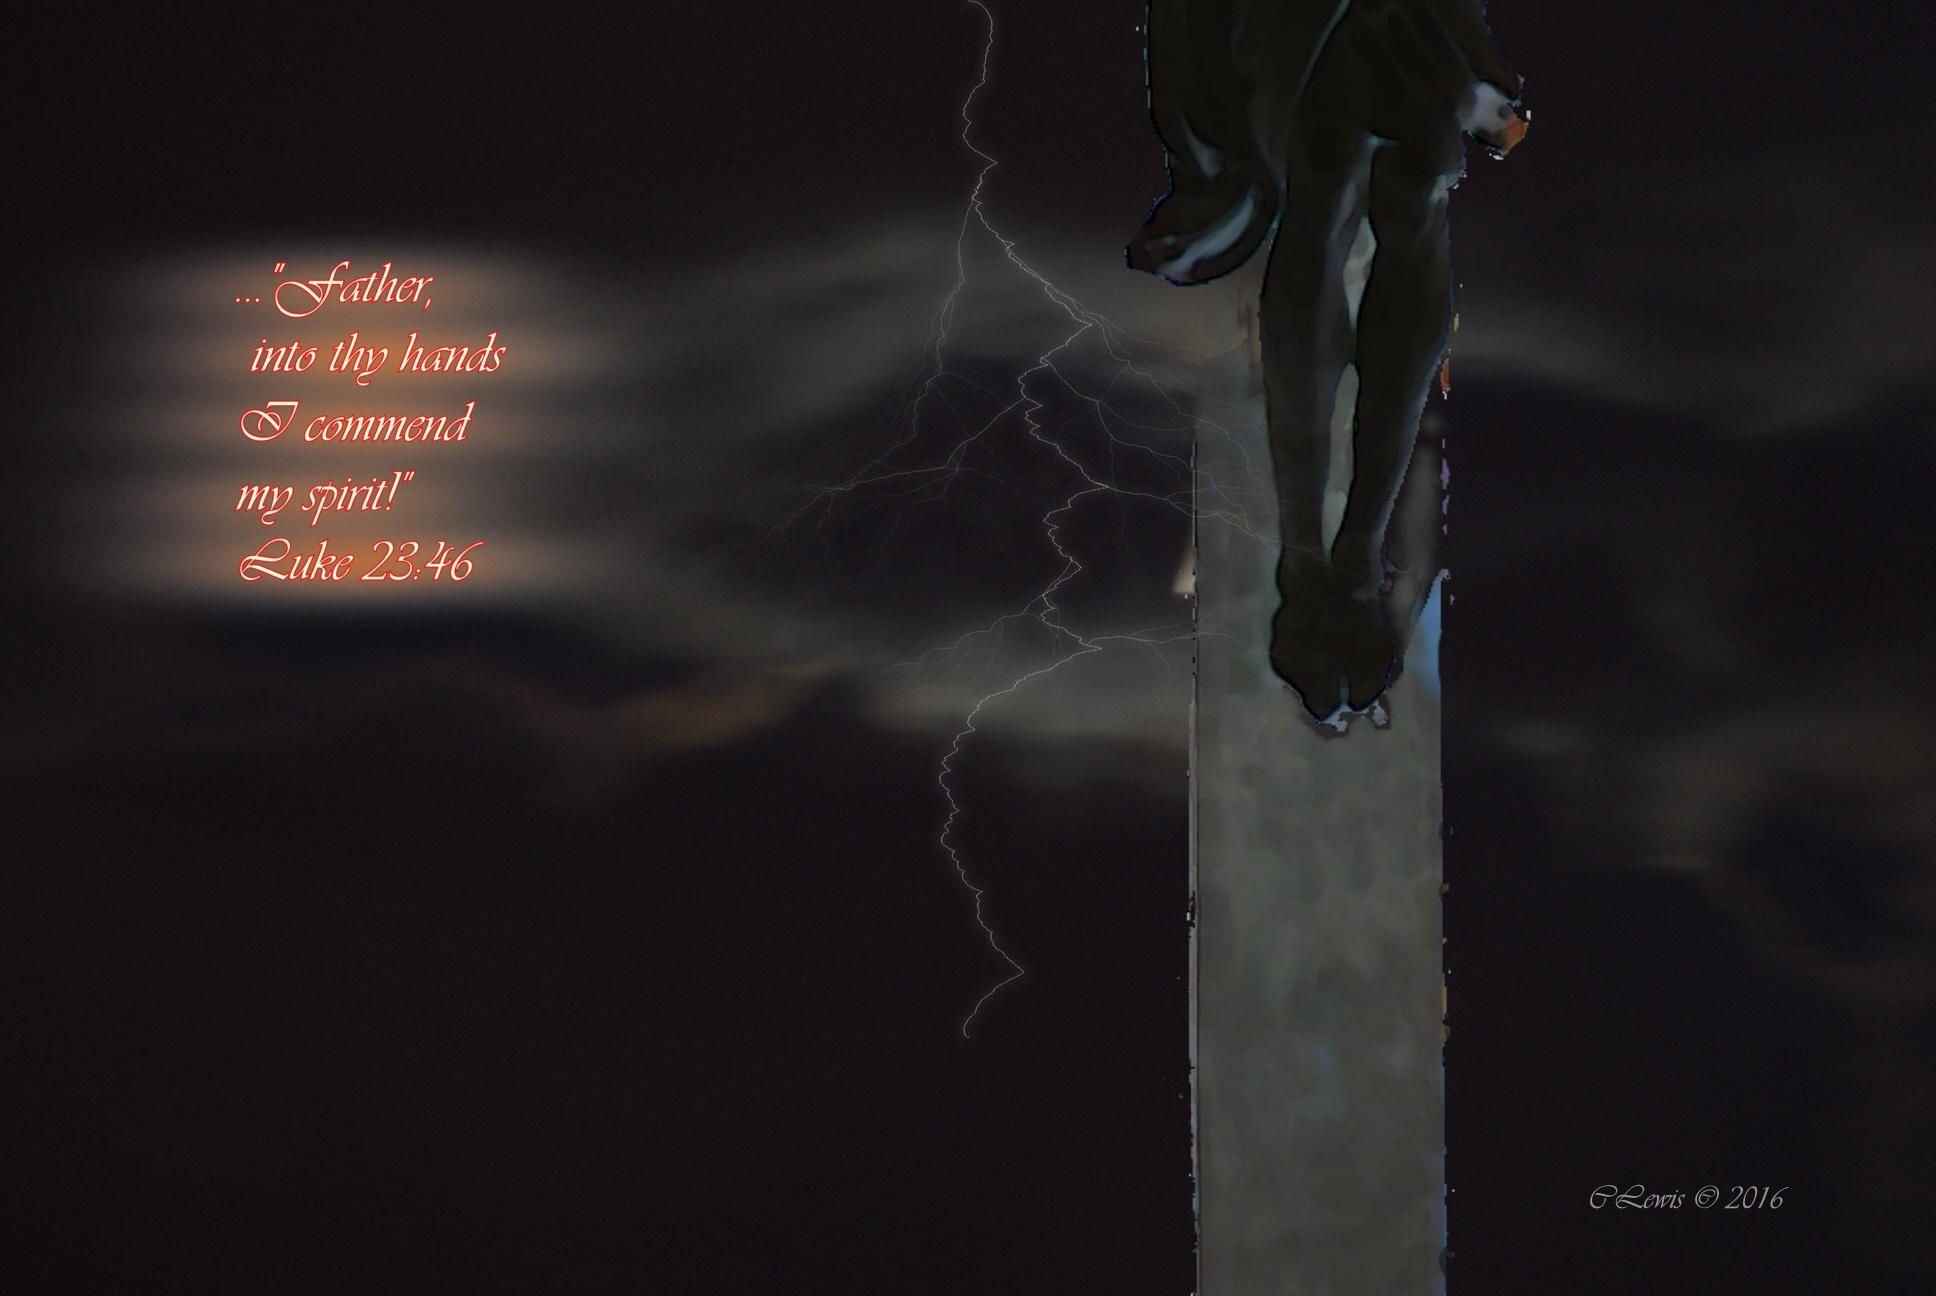 FearlessLuke 23 46 2